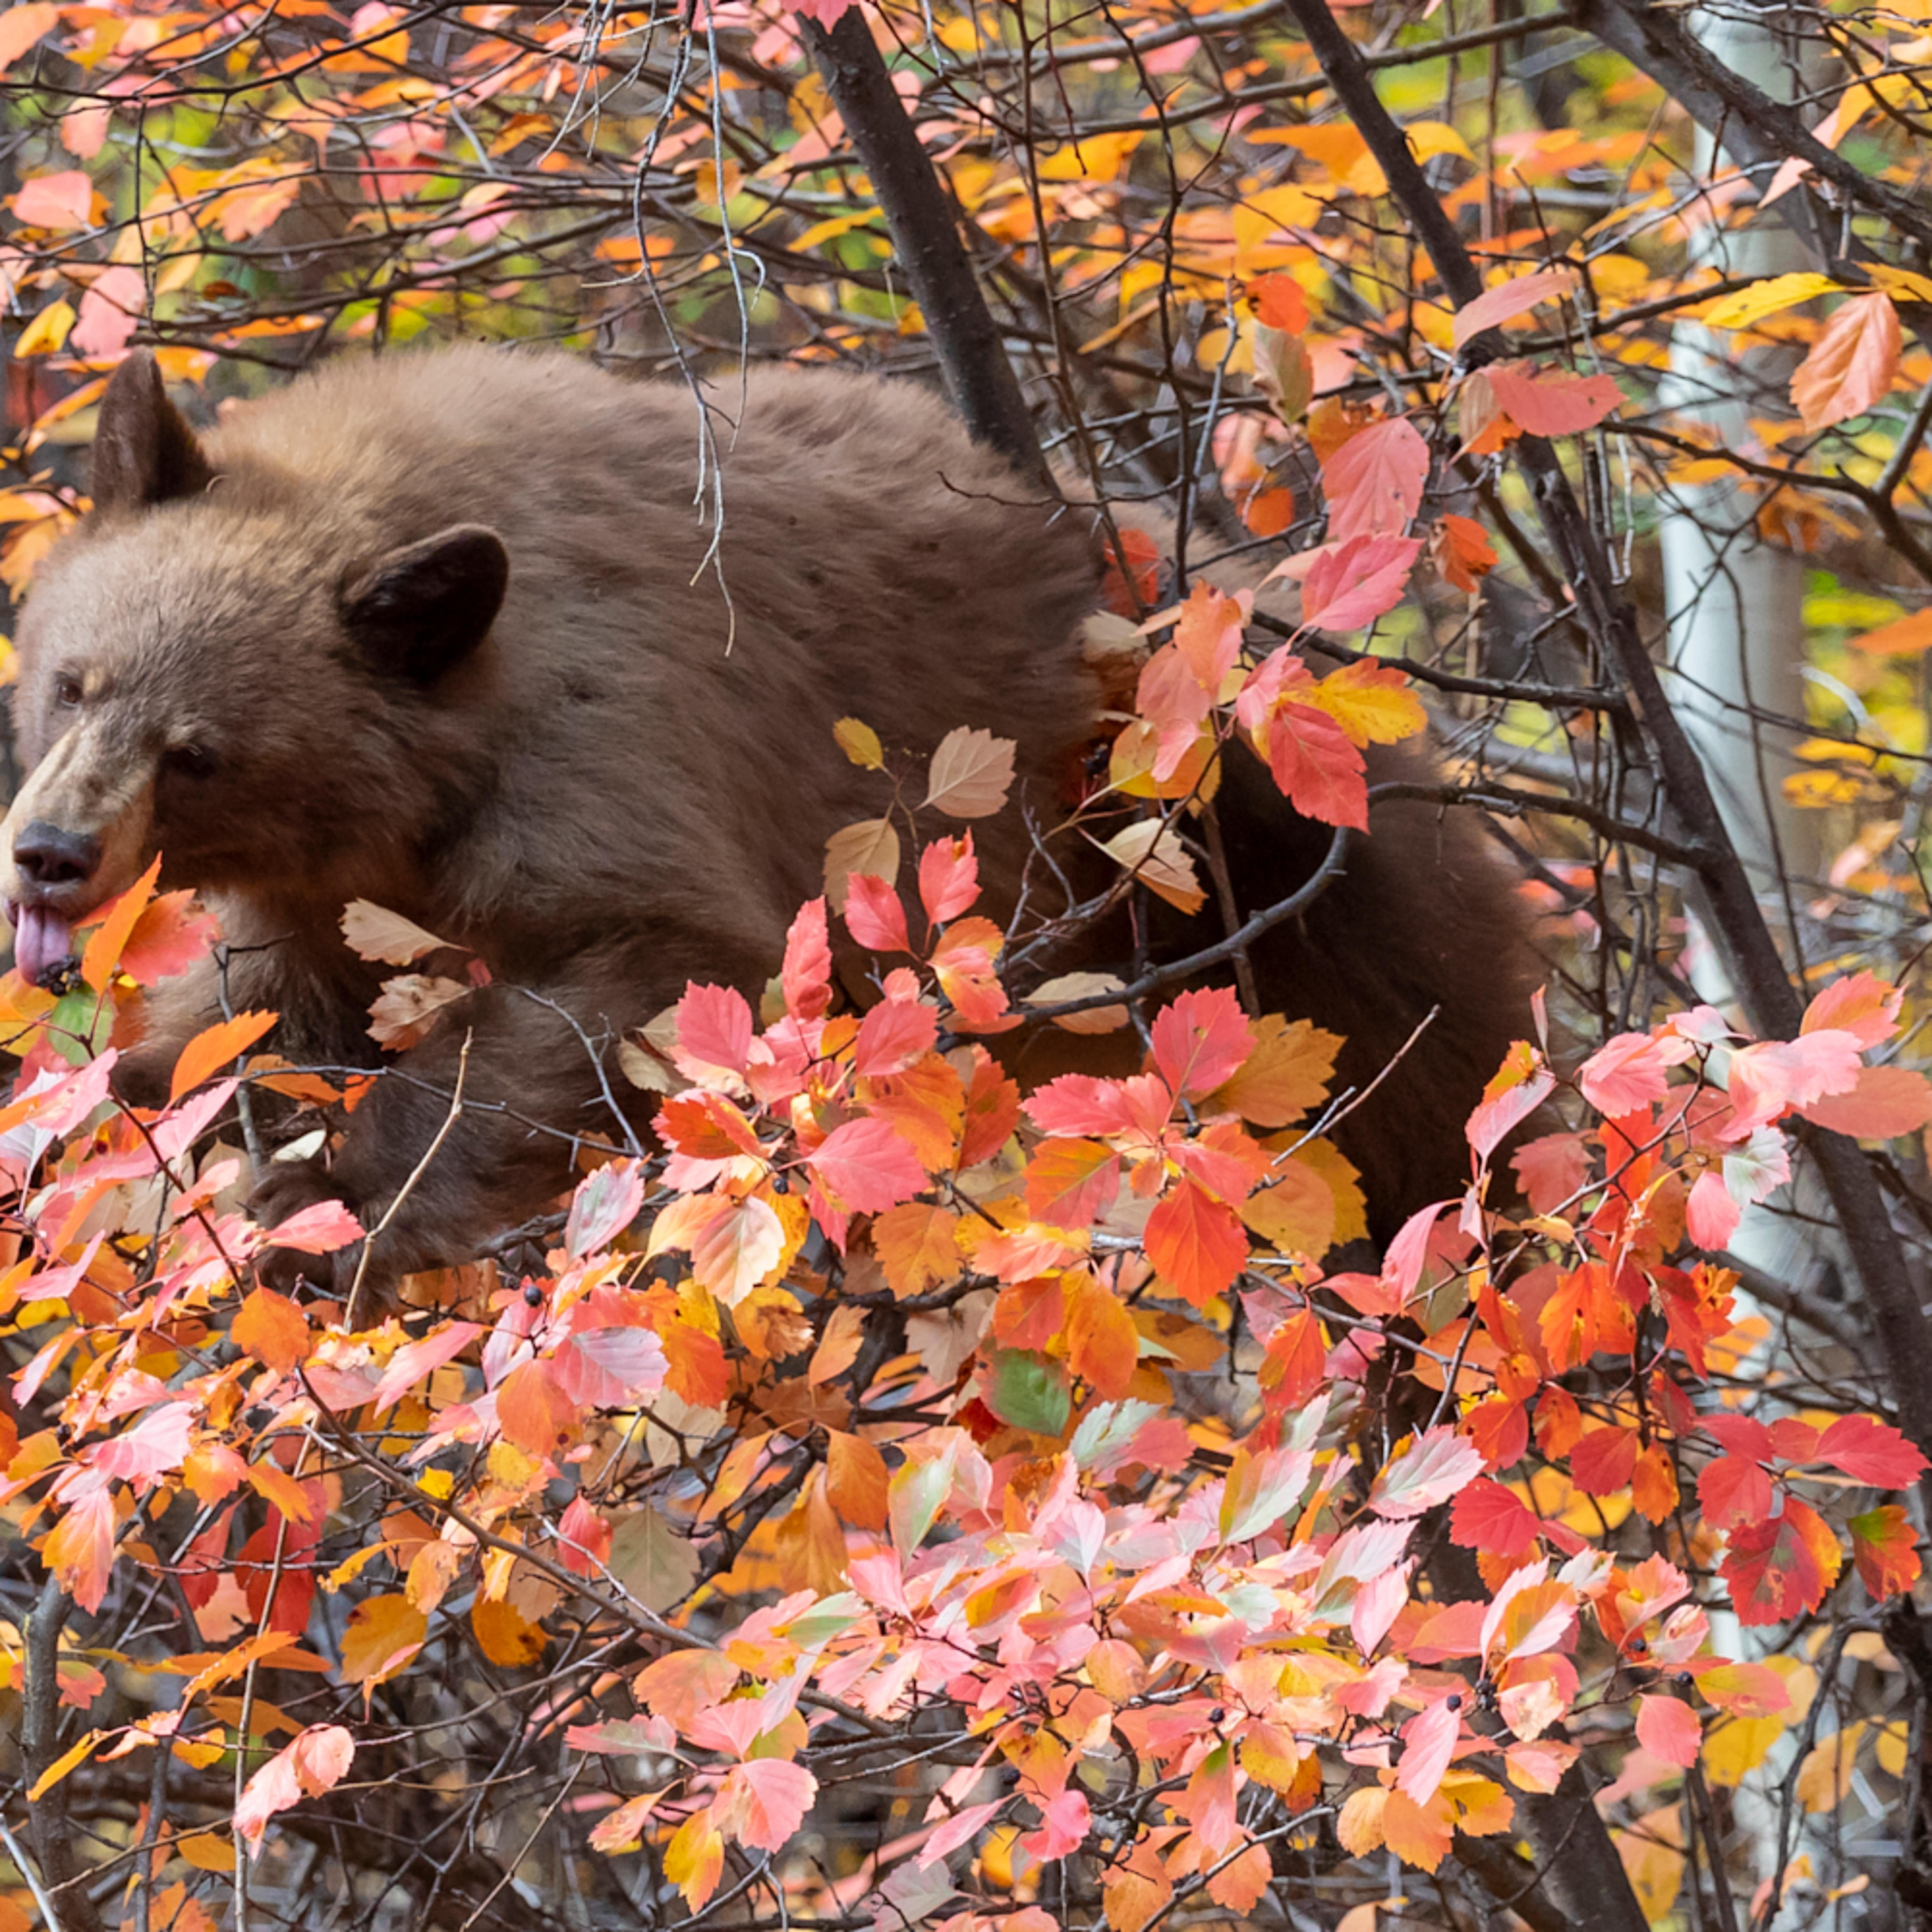 Bear r6a2558 g1hc2g